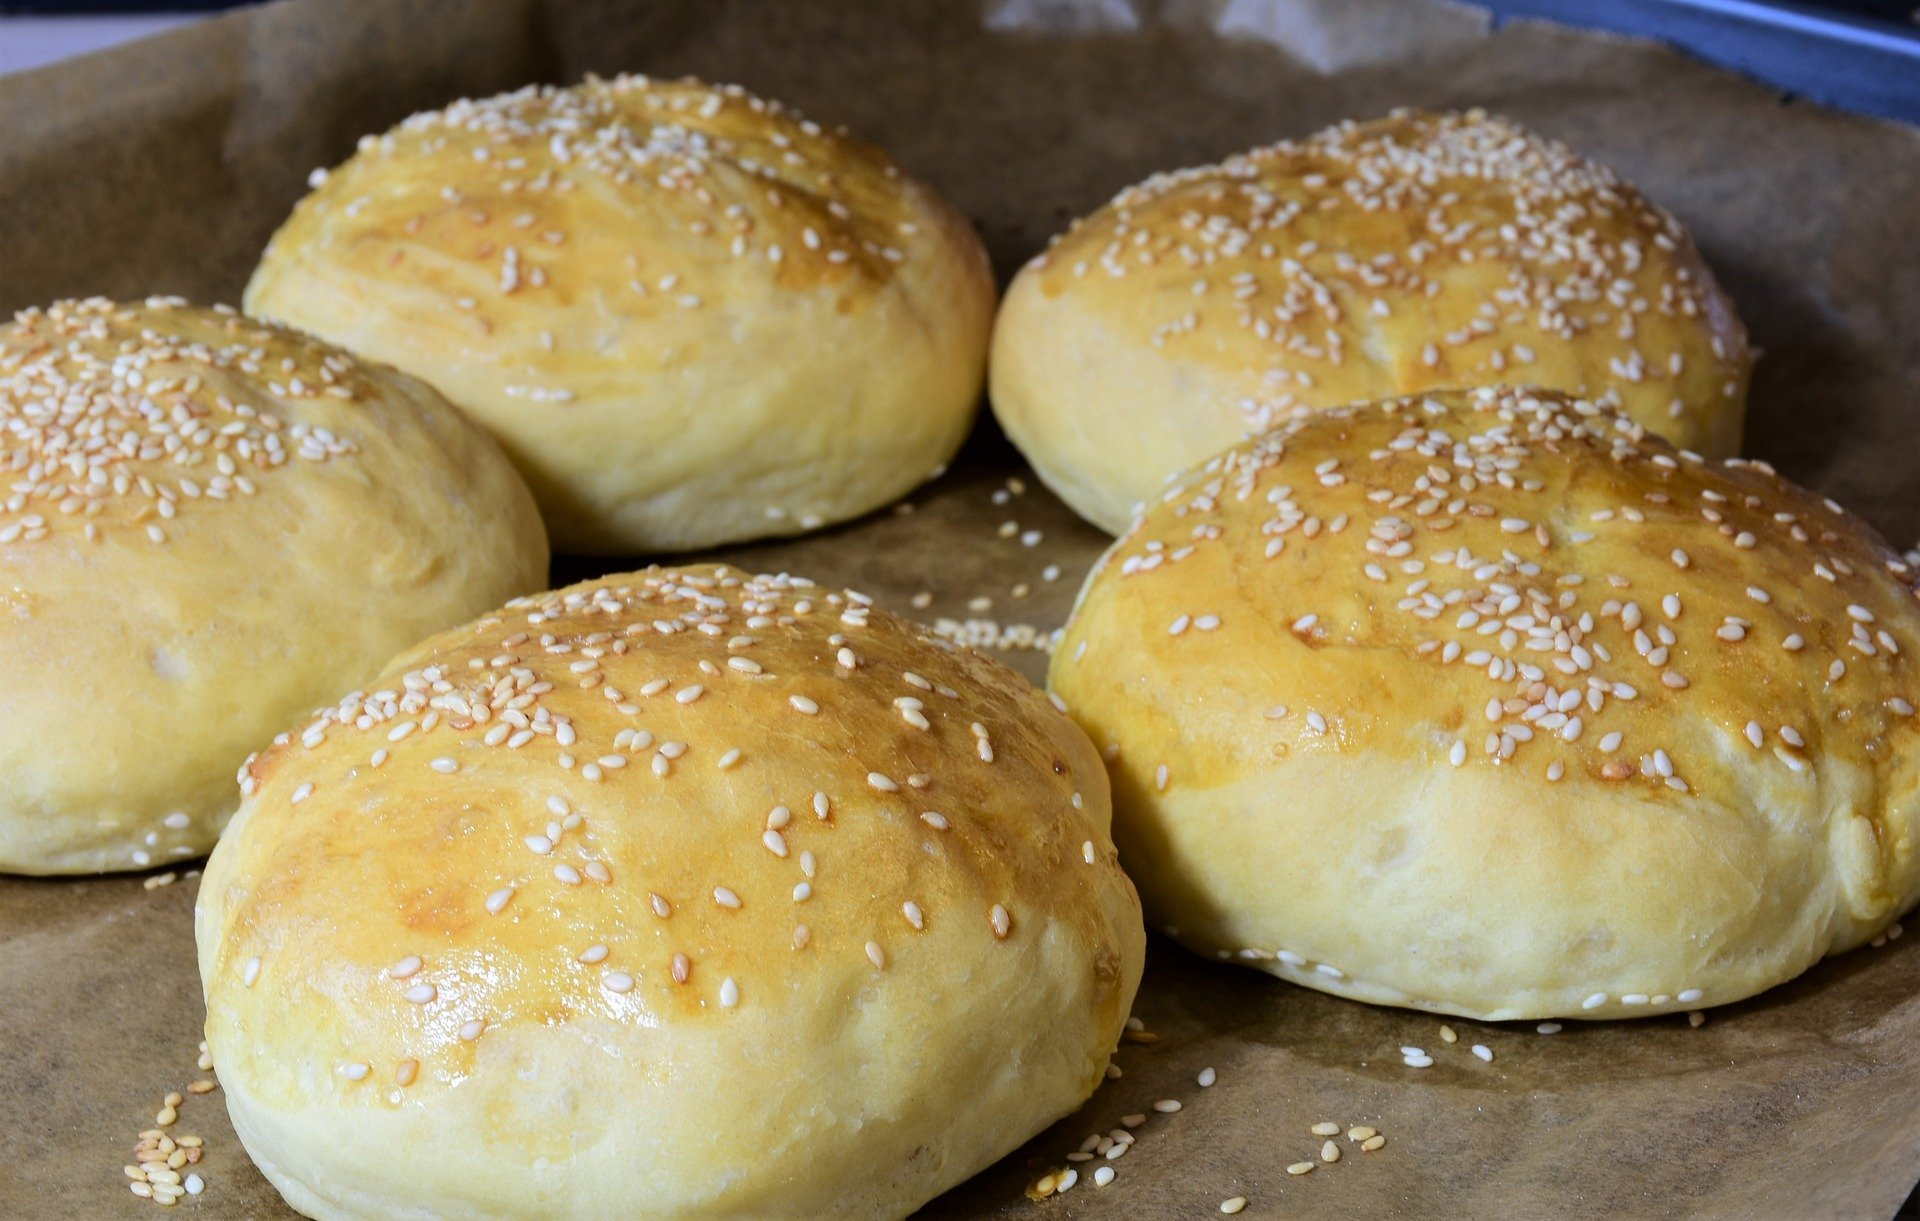 Low-Carb Sesam Brötchen mit Mandelcreme